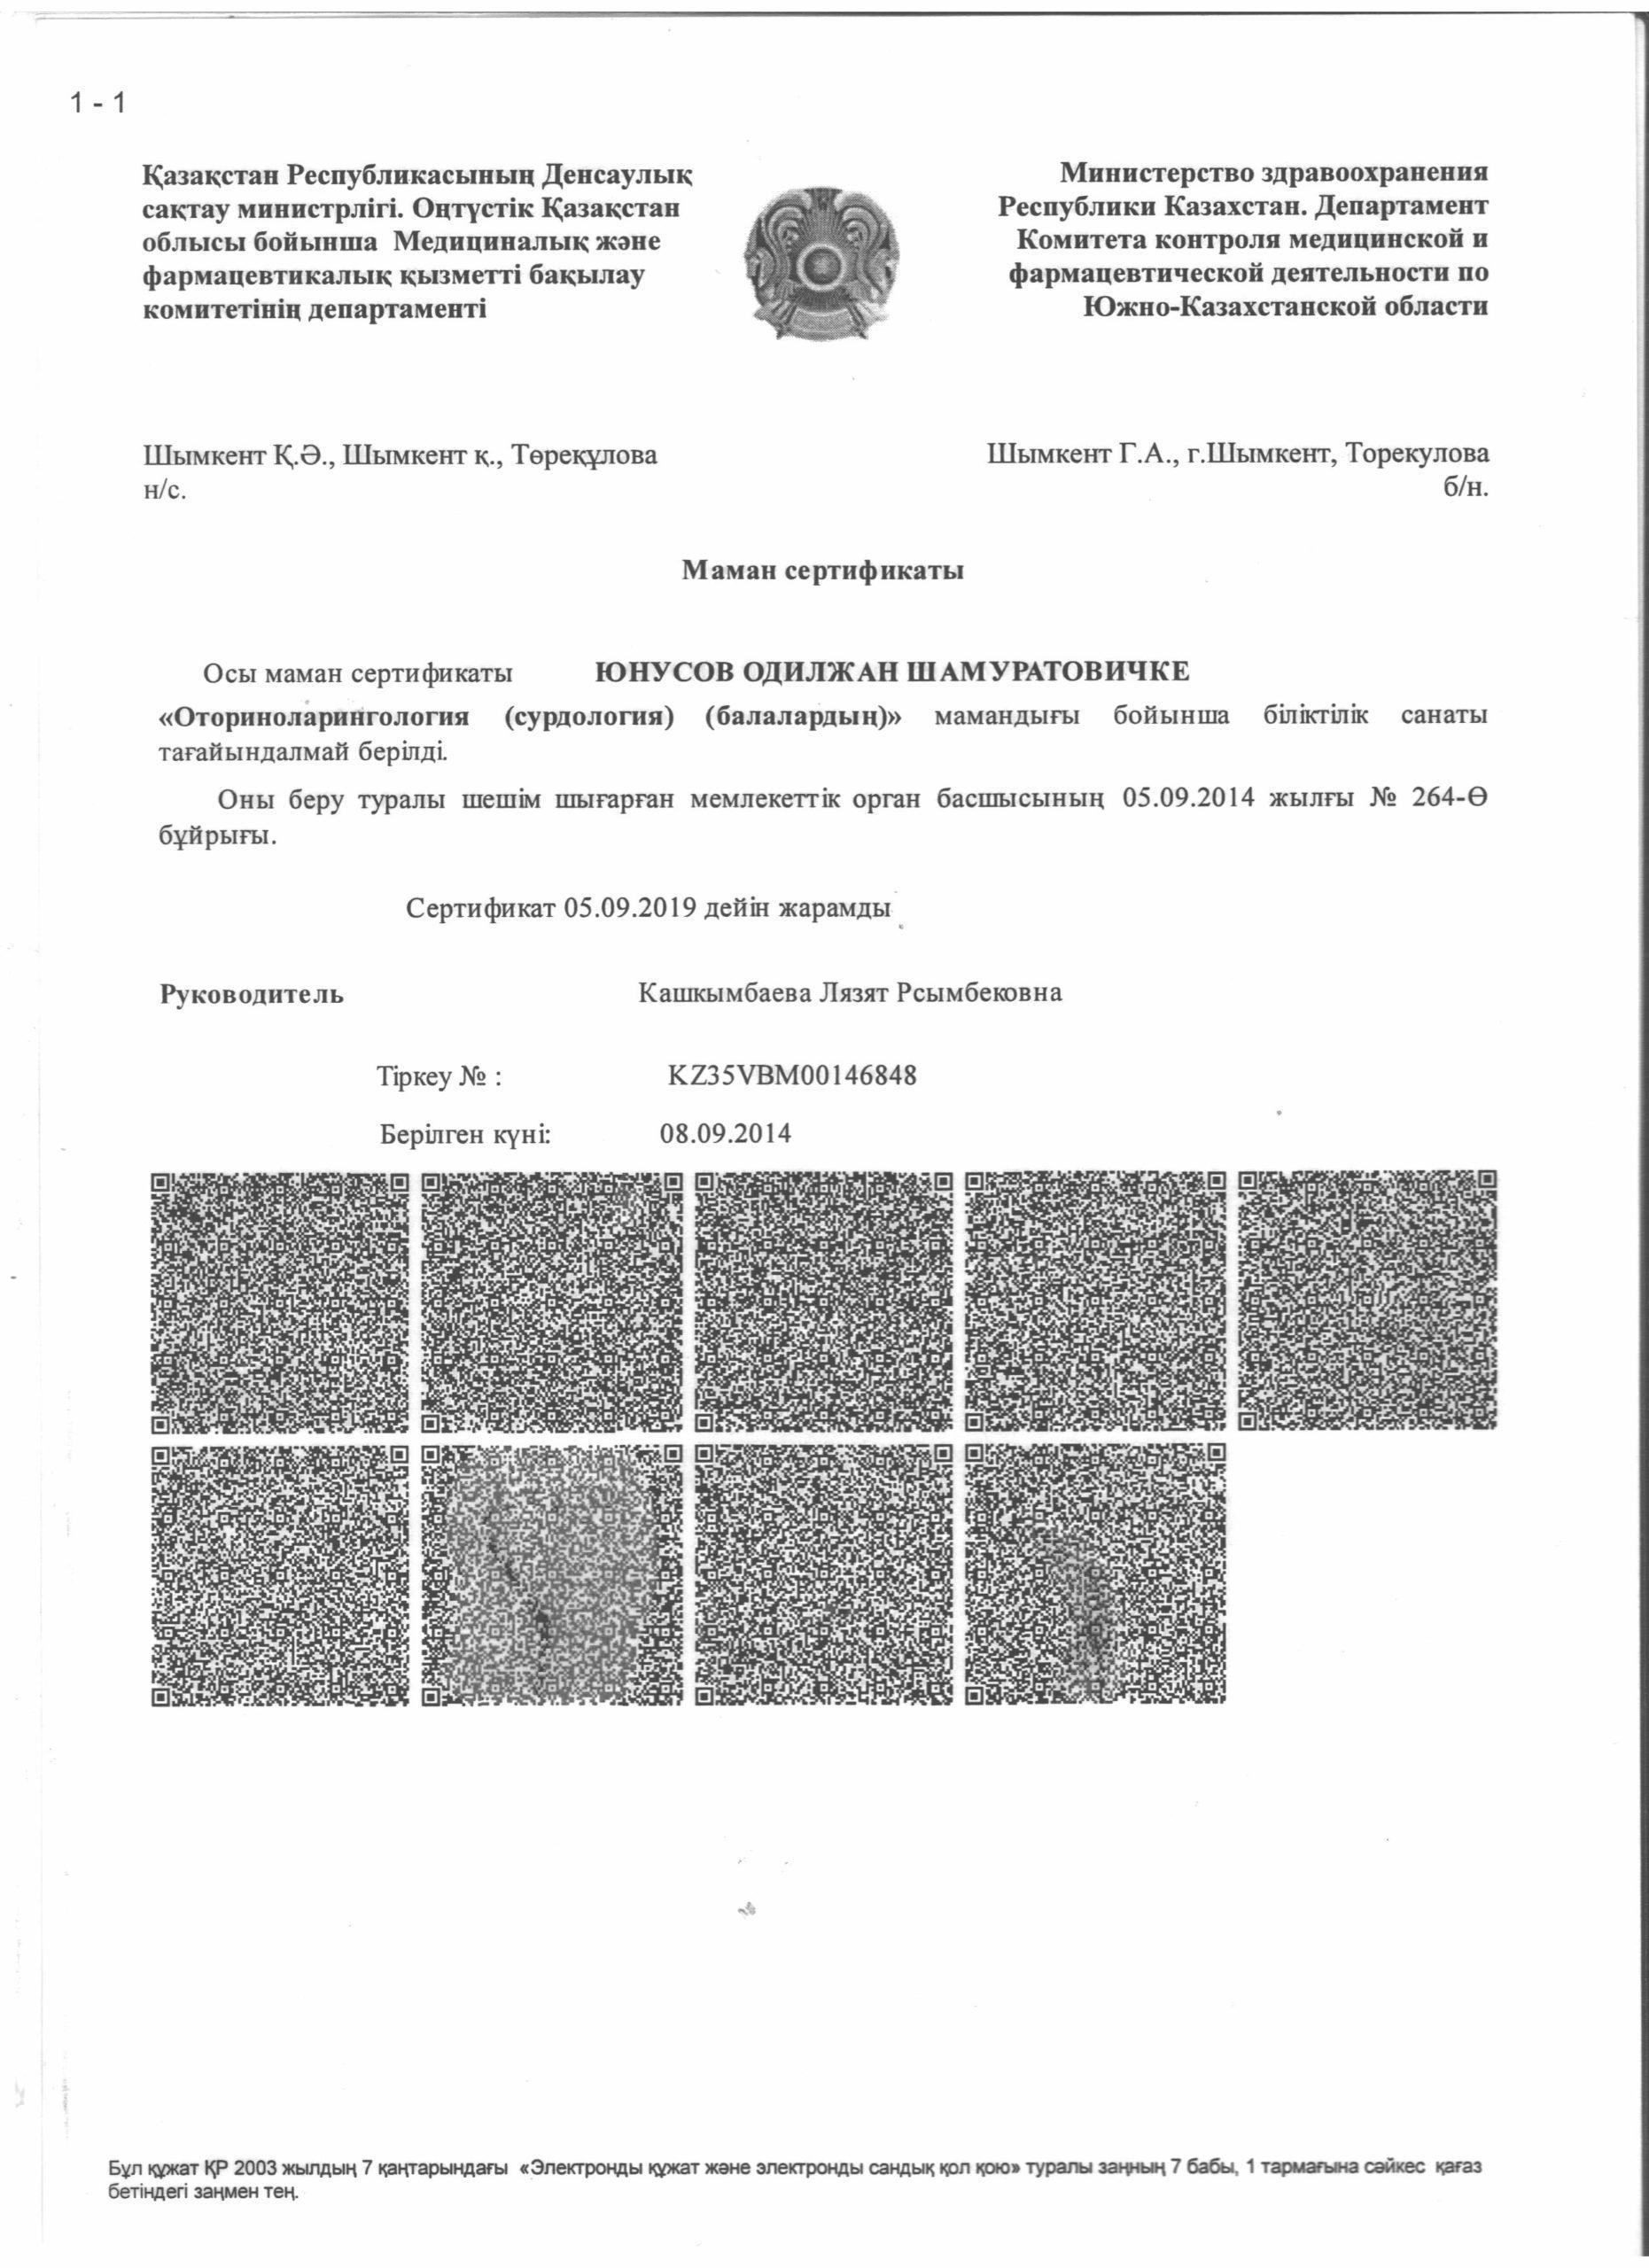 Сертификат Лора клиники Akniet Shipa сайрамский р-н. с. Карабулак